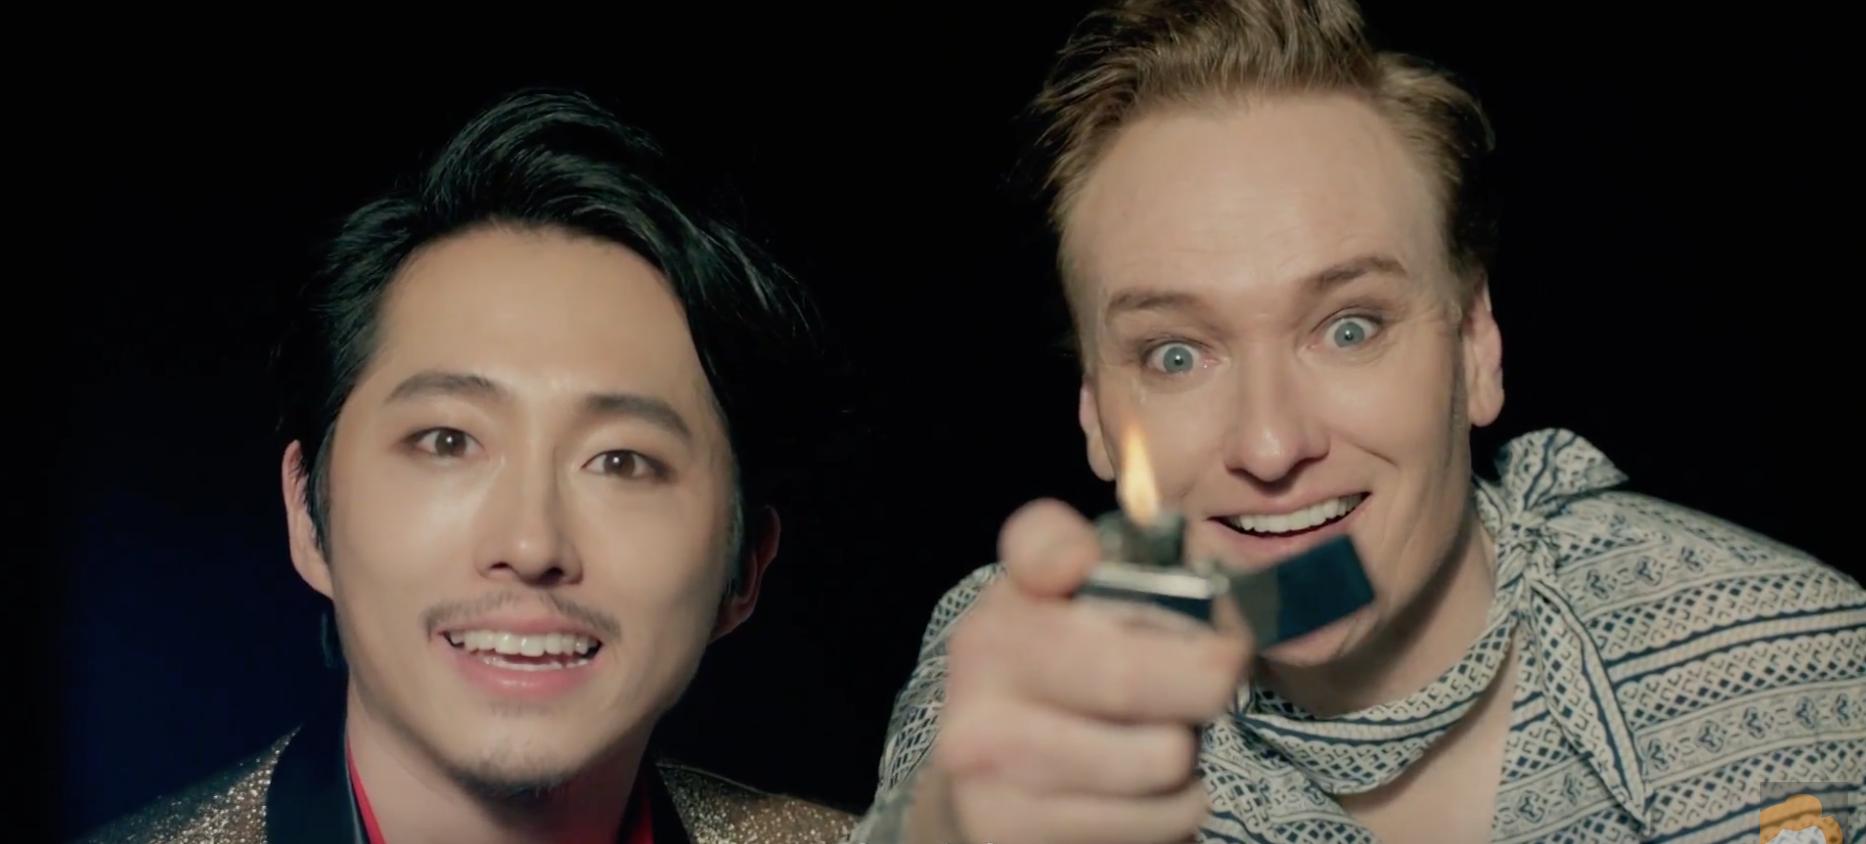 "Conan O'Brien and Steven Yeun Become K-Pop Stars in Park Jin Young's ""Fire"" MV"